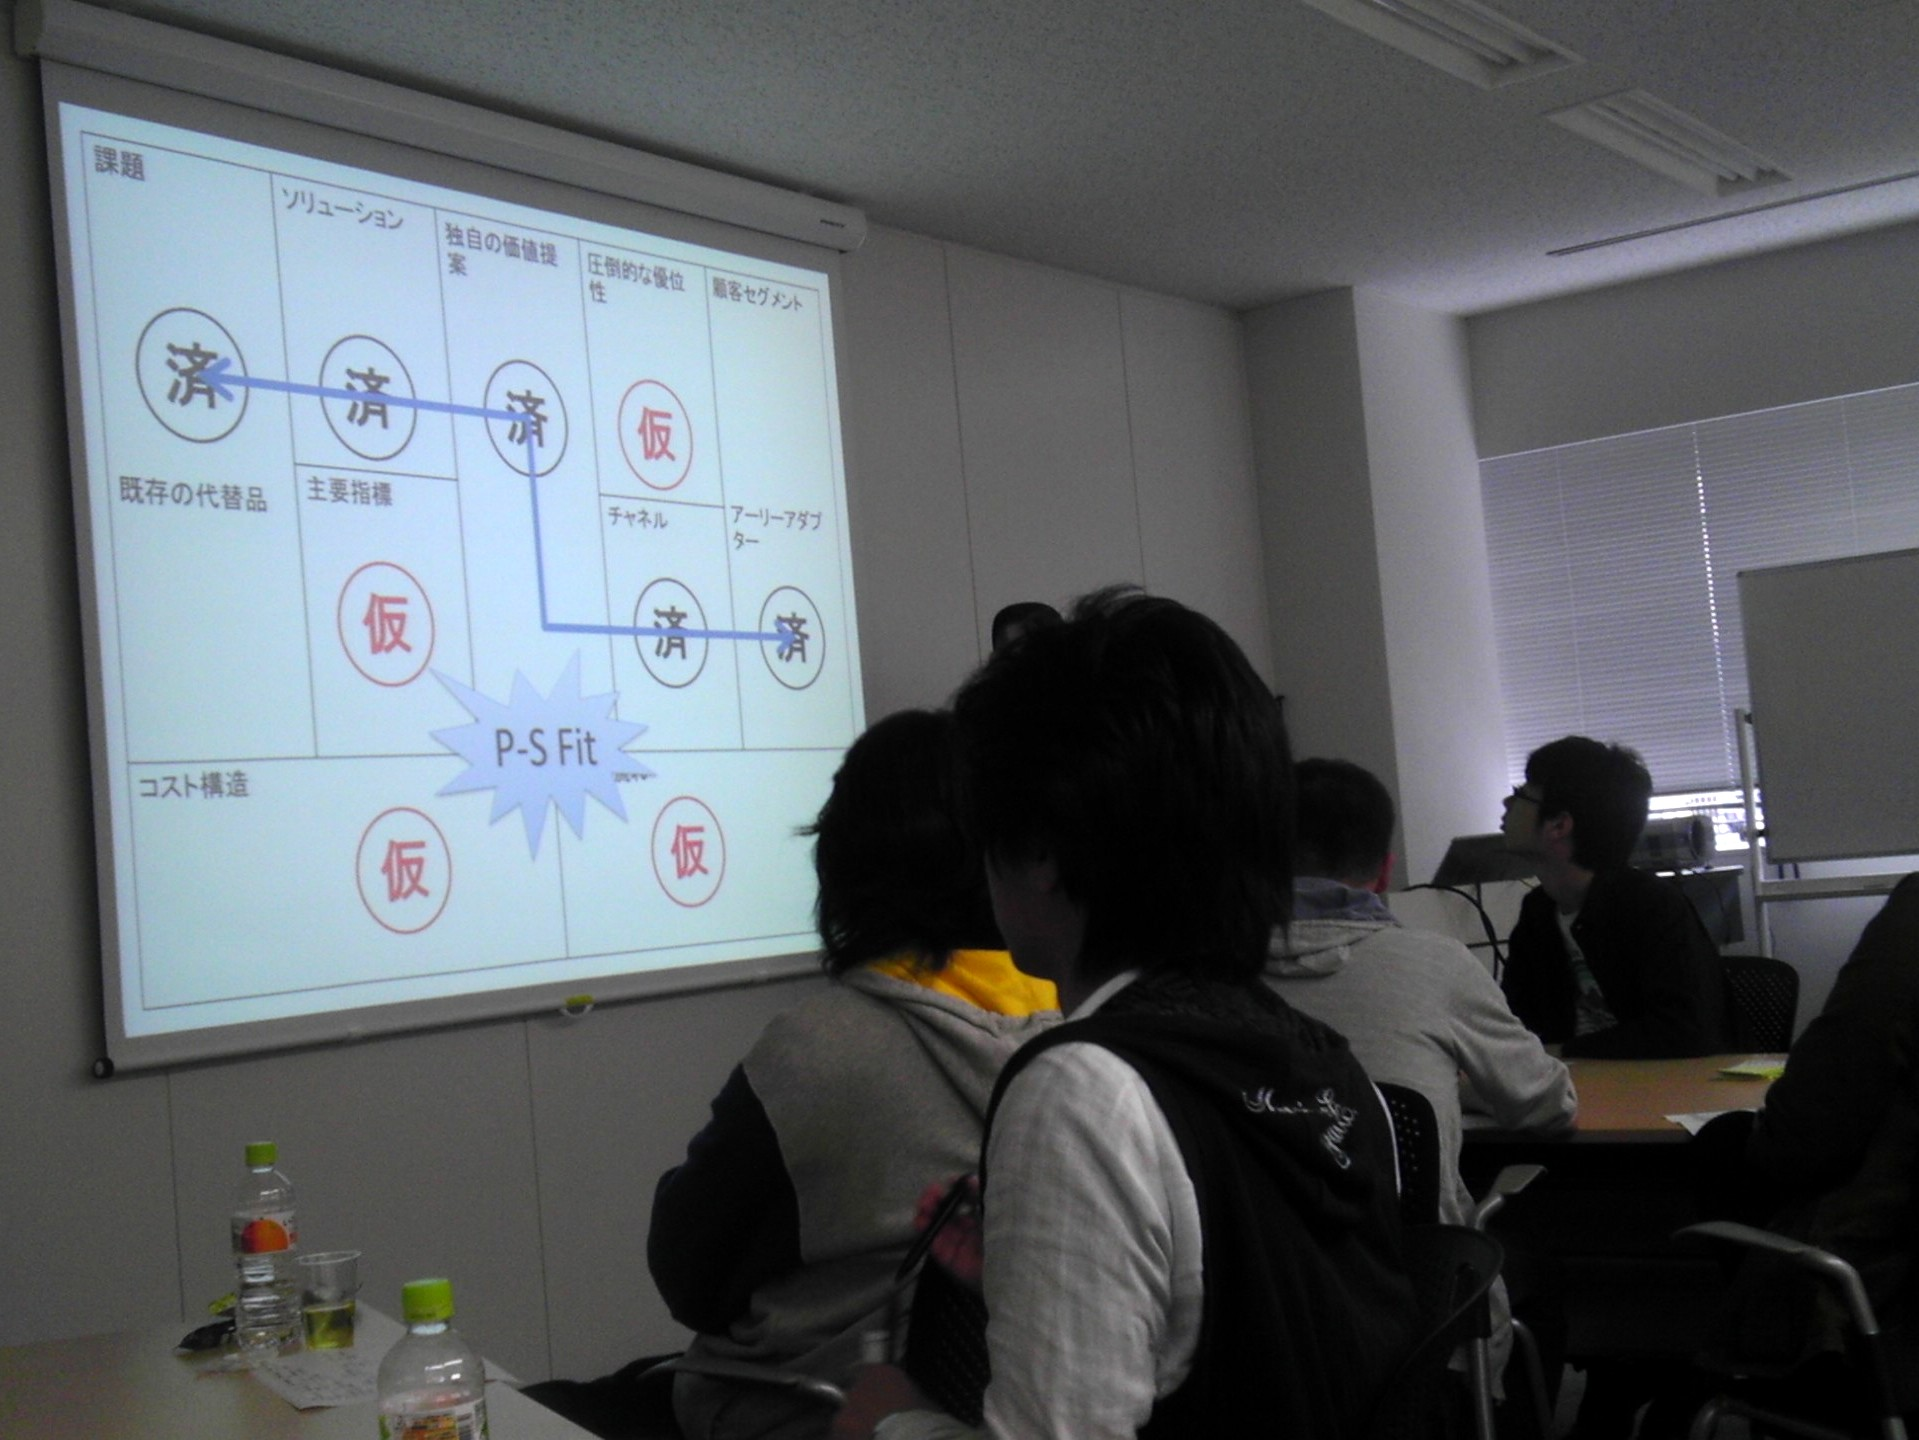 agilejapan仙台_P-S Fit